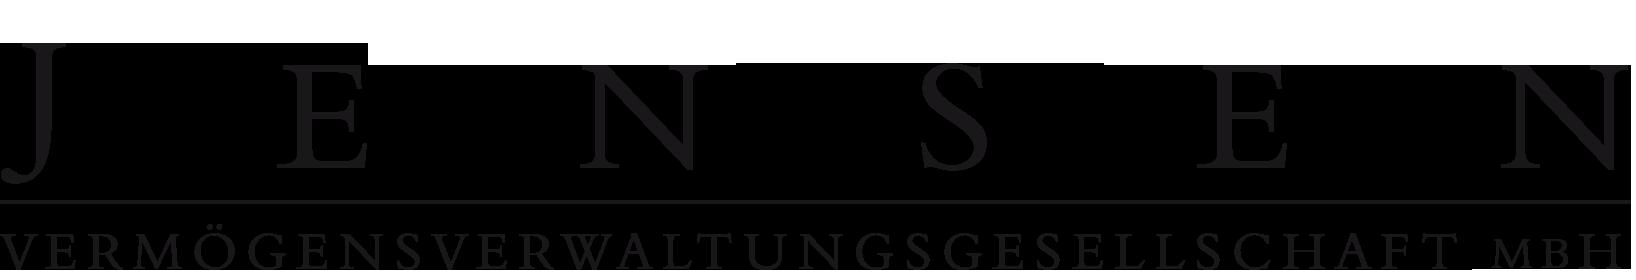 Logo for JENSEN Vermögensverwaltungsgesellschaft mbH & Co OHG